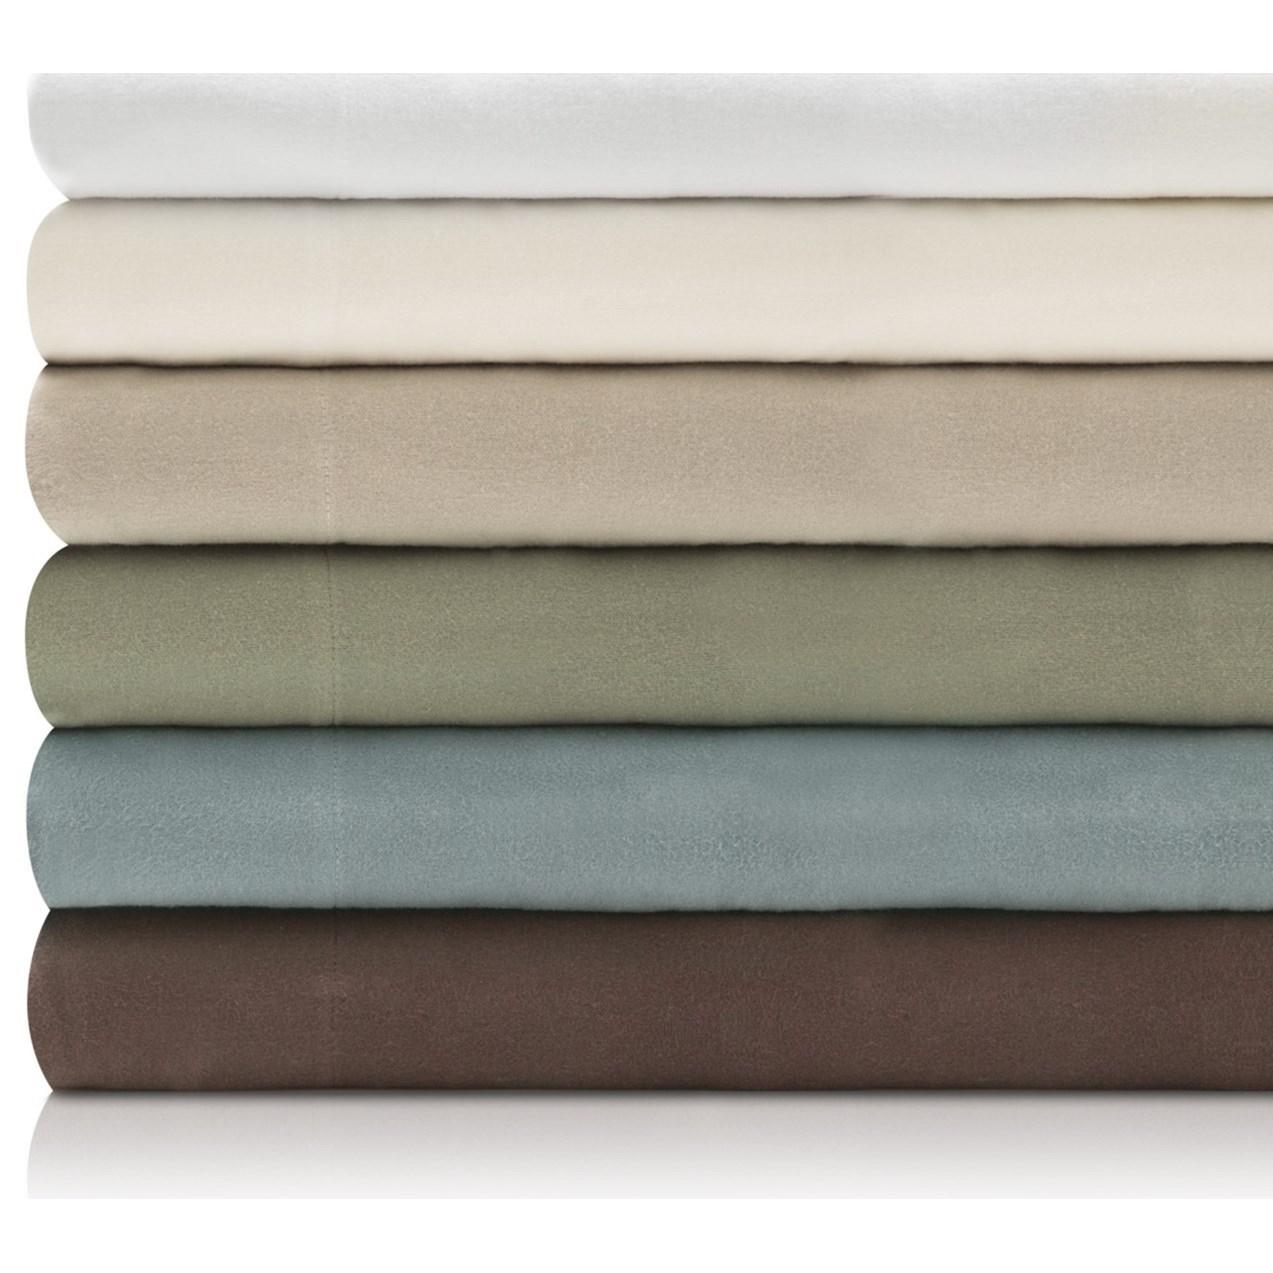 Malouf Portuguese Flannel Full Woven™ Portuguese Flannel Sheet Set - Item Number: WO19FFIVFS